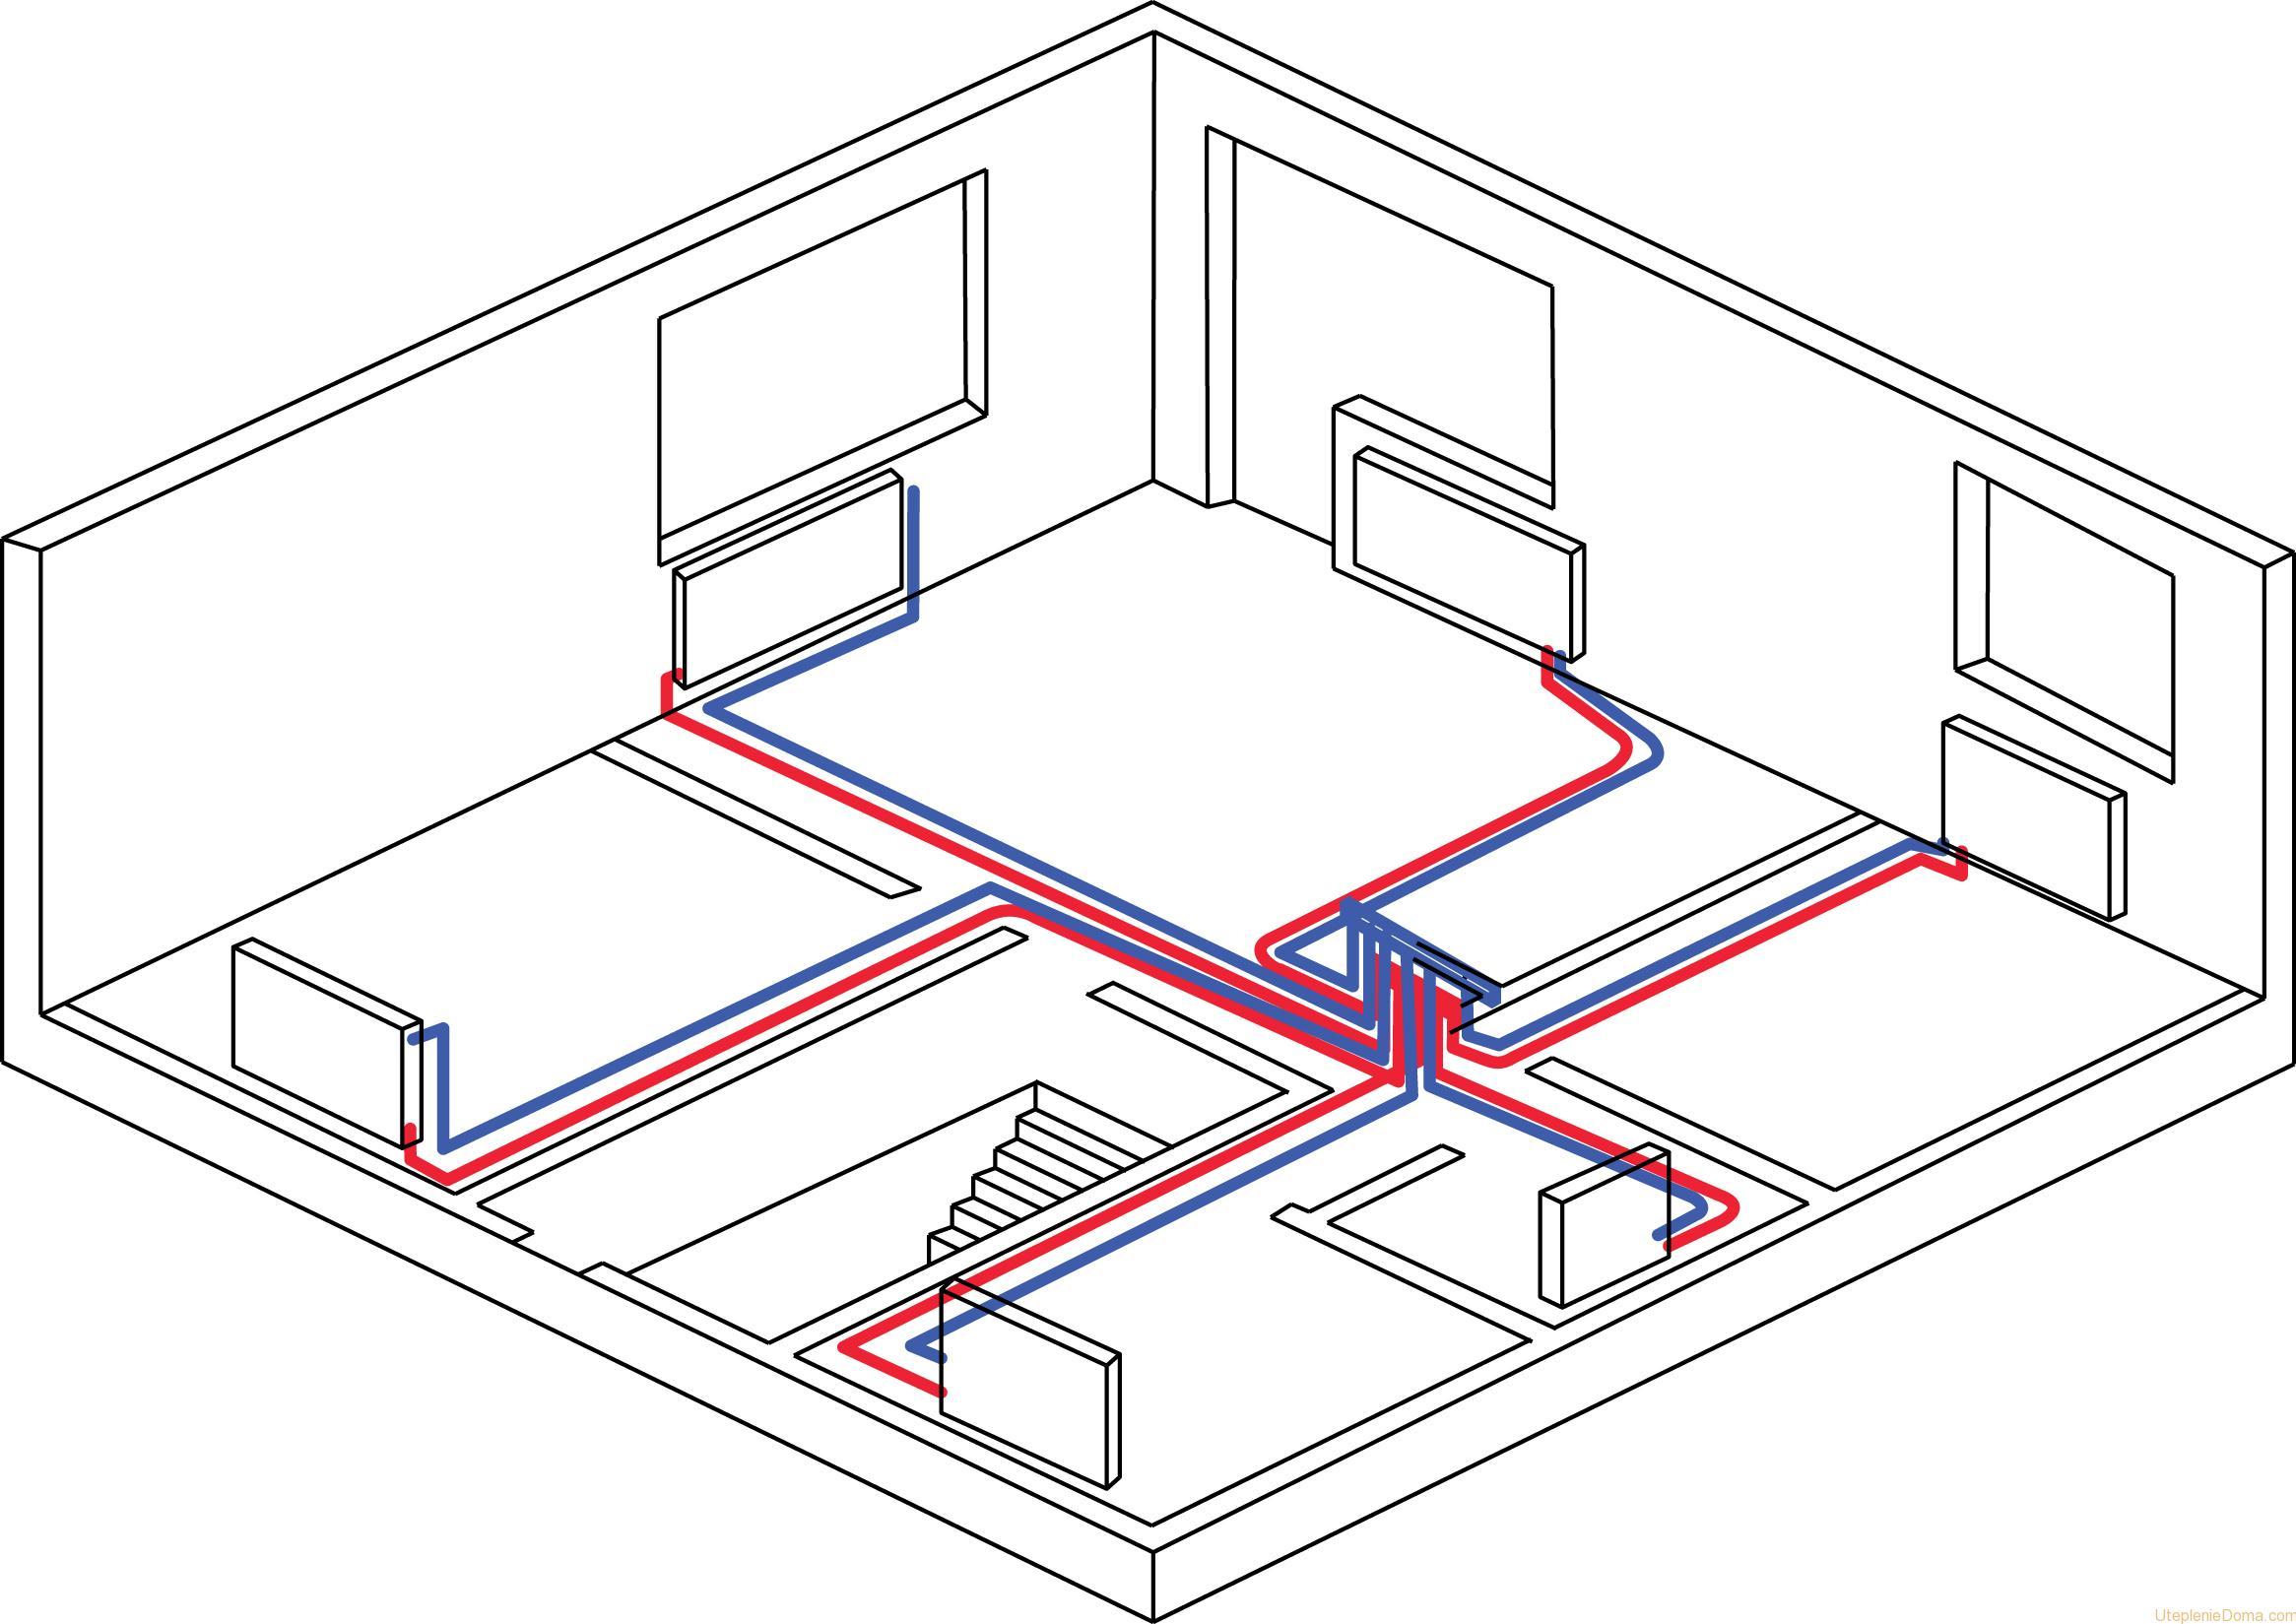 Кронштейн для батарей отопления